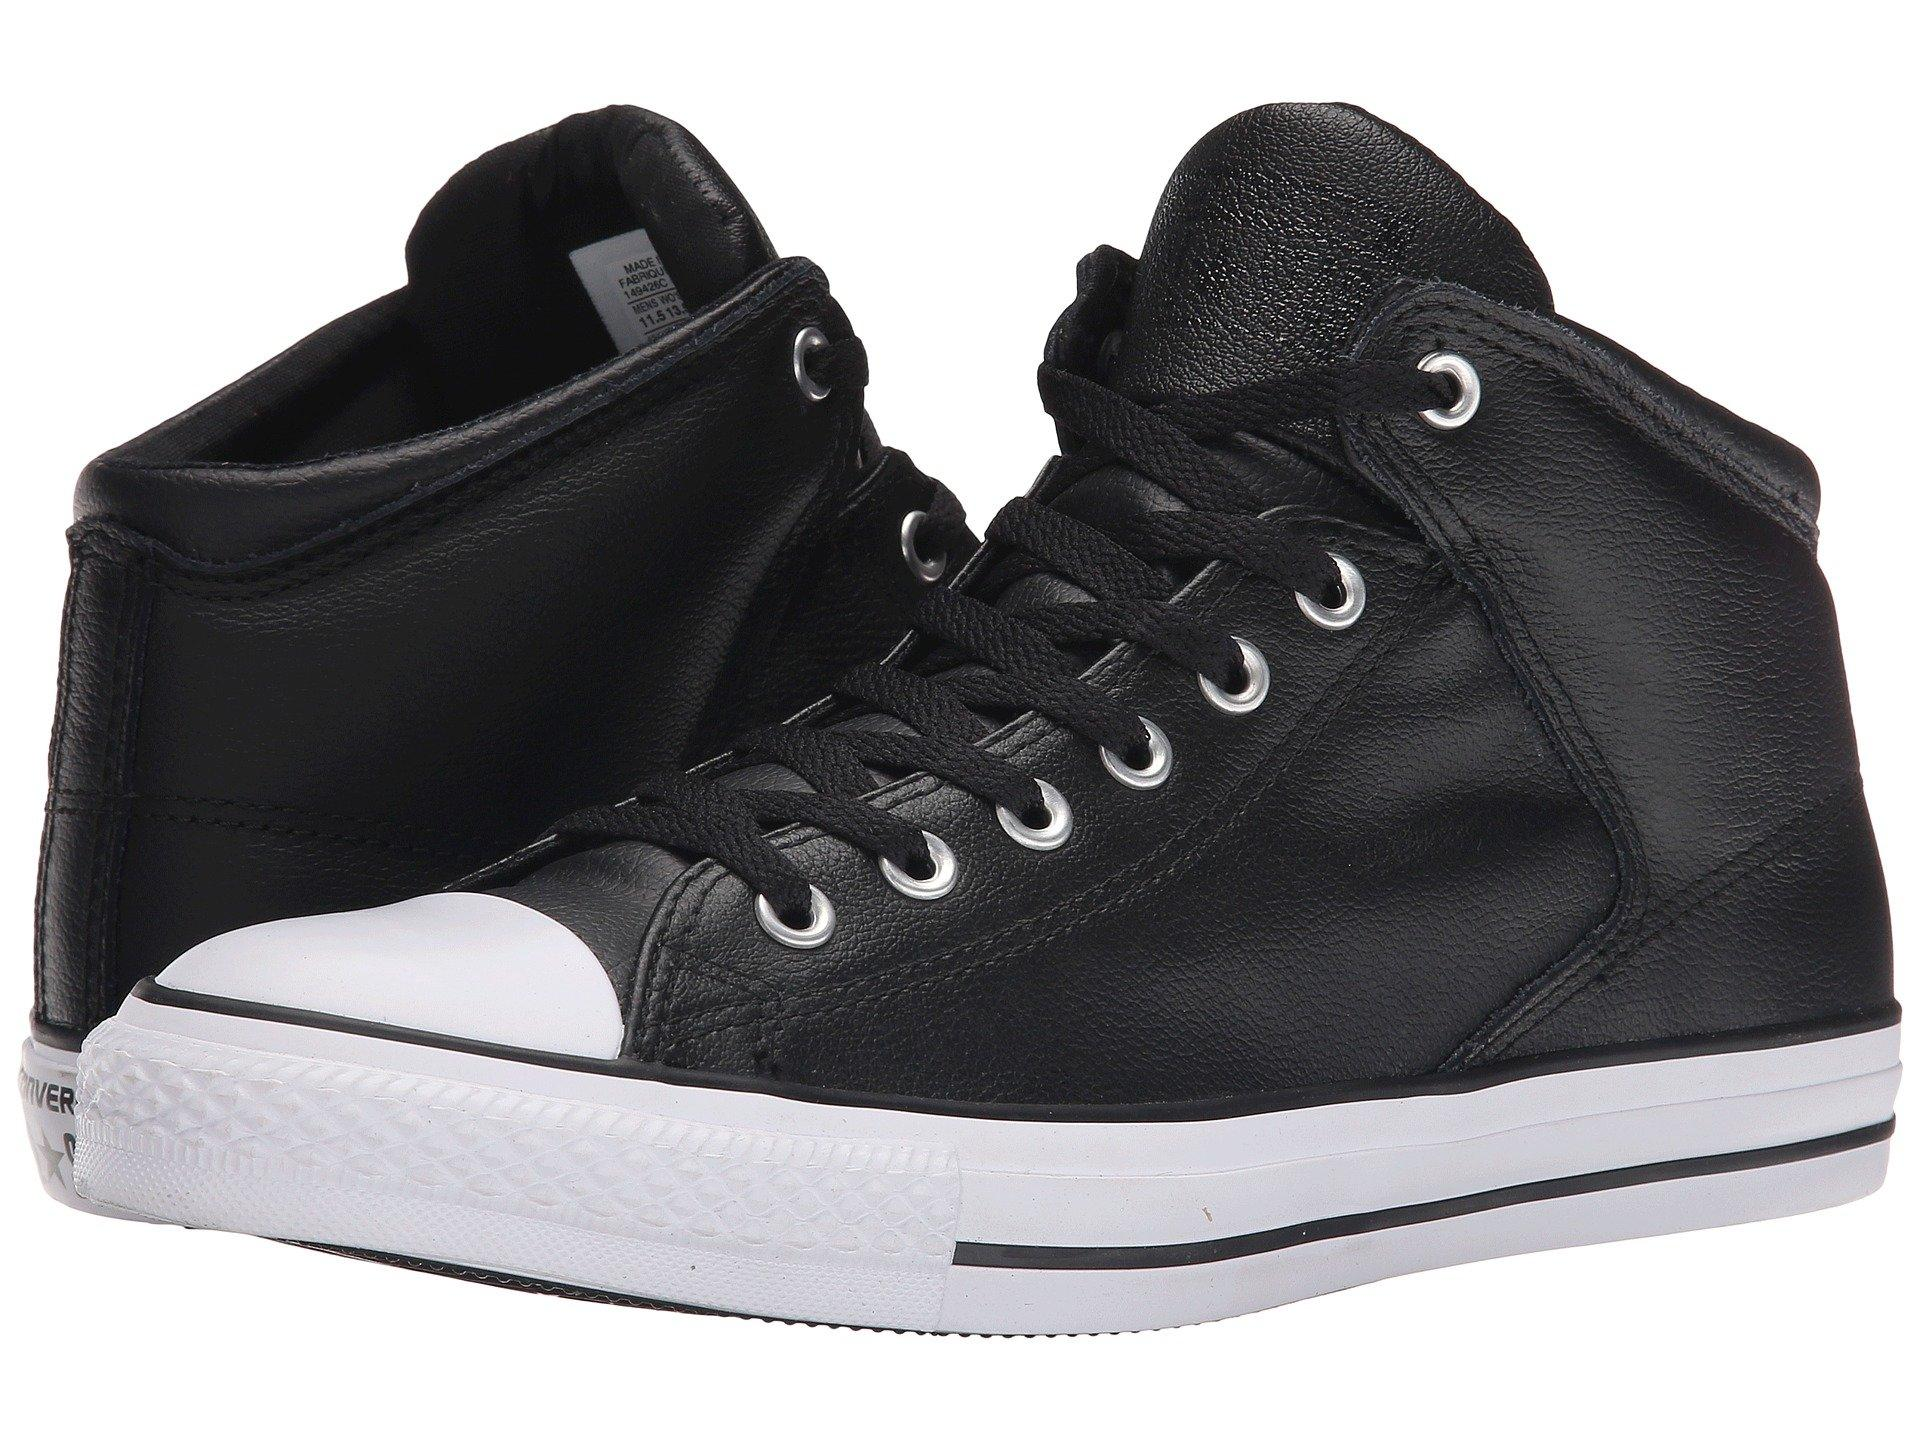 4c62a530c8035c Converse Chuck Taylor® All Star® Hi Street Leather